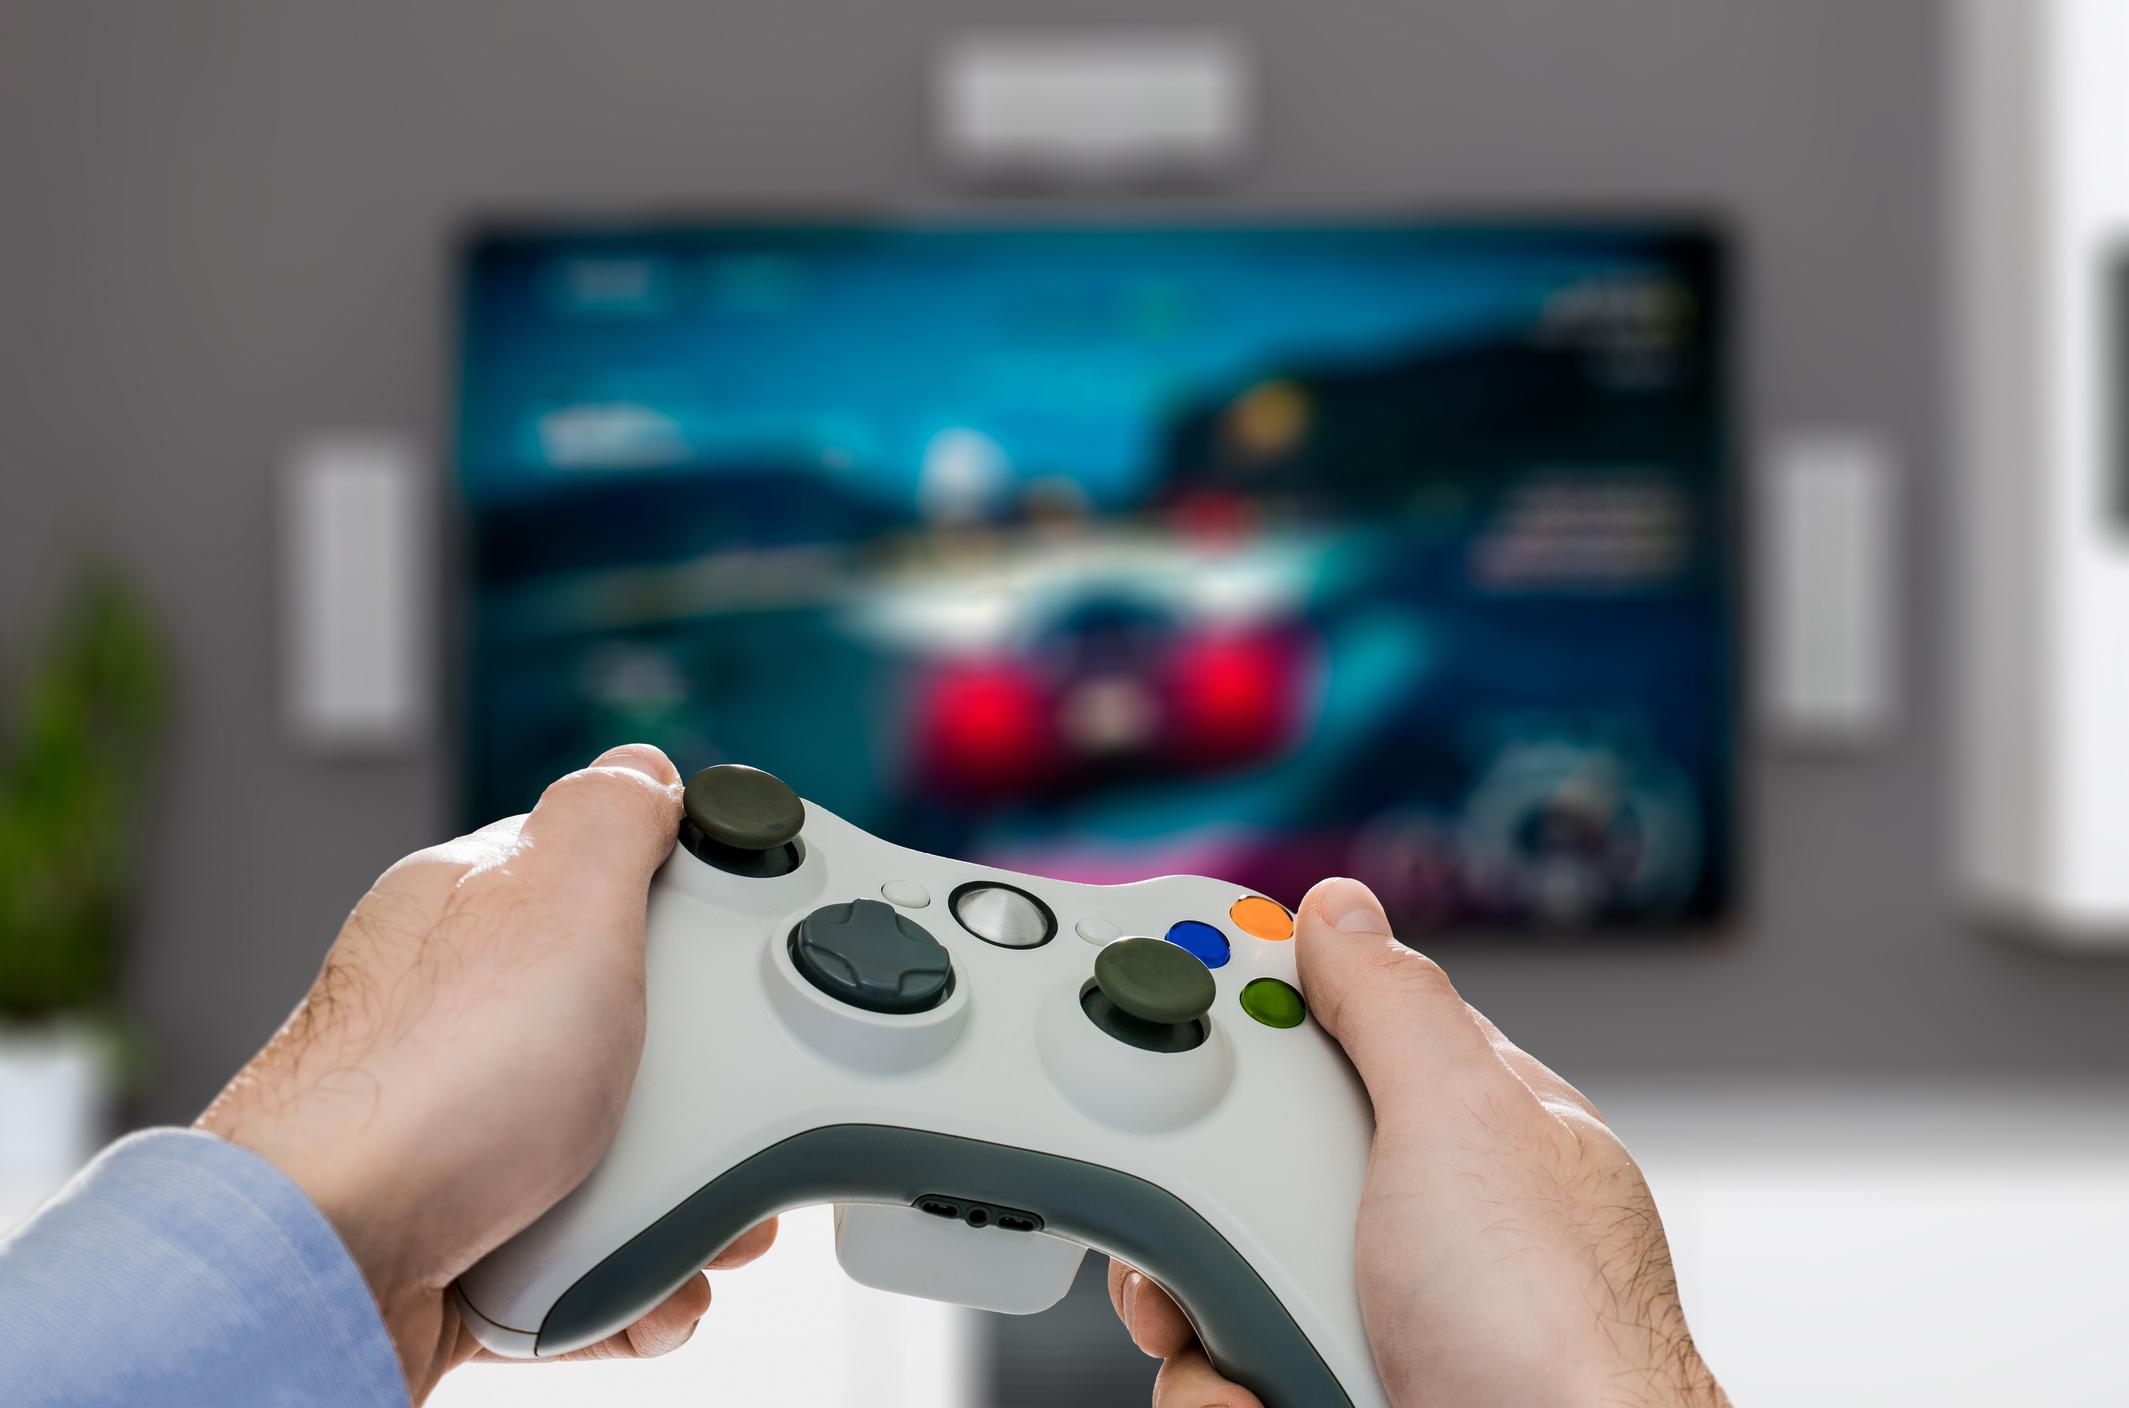 Gamestop Will Be Just Fine   Until It Isn't | The Motley Fool